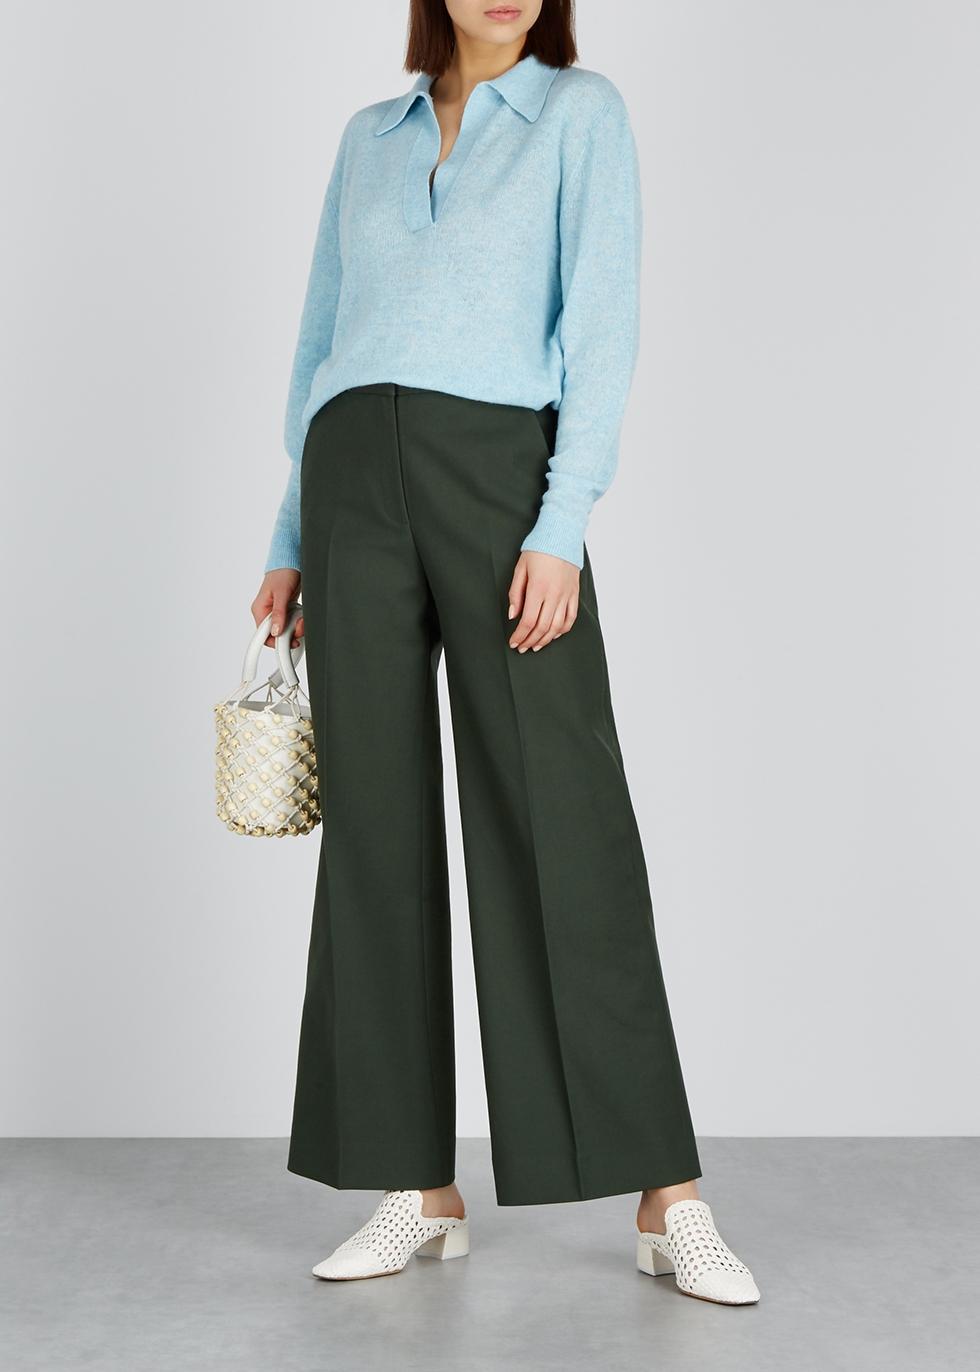 Jo blue cashmere-blend jumper - Khaite